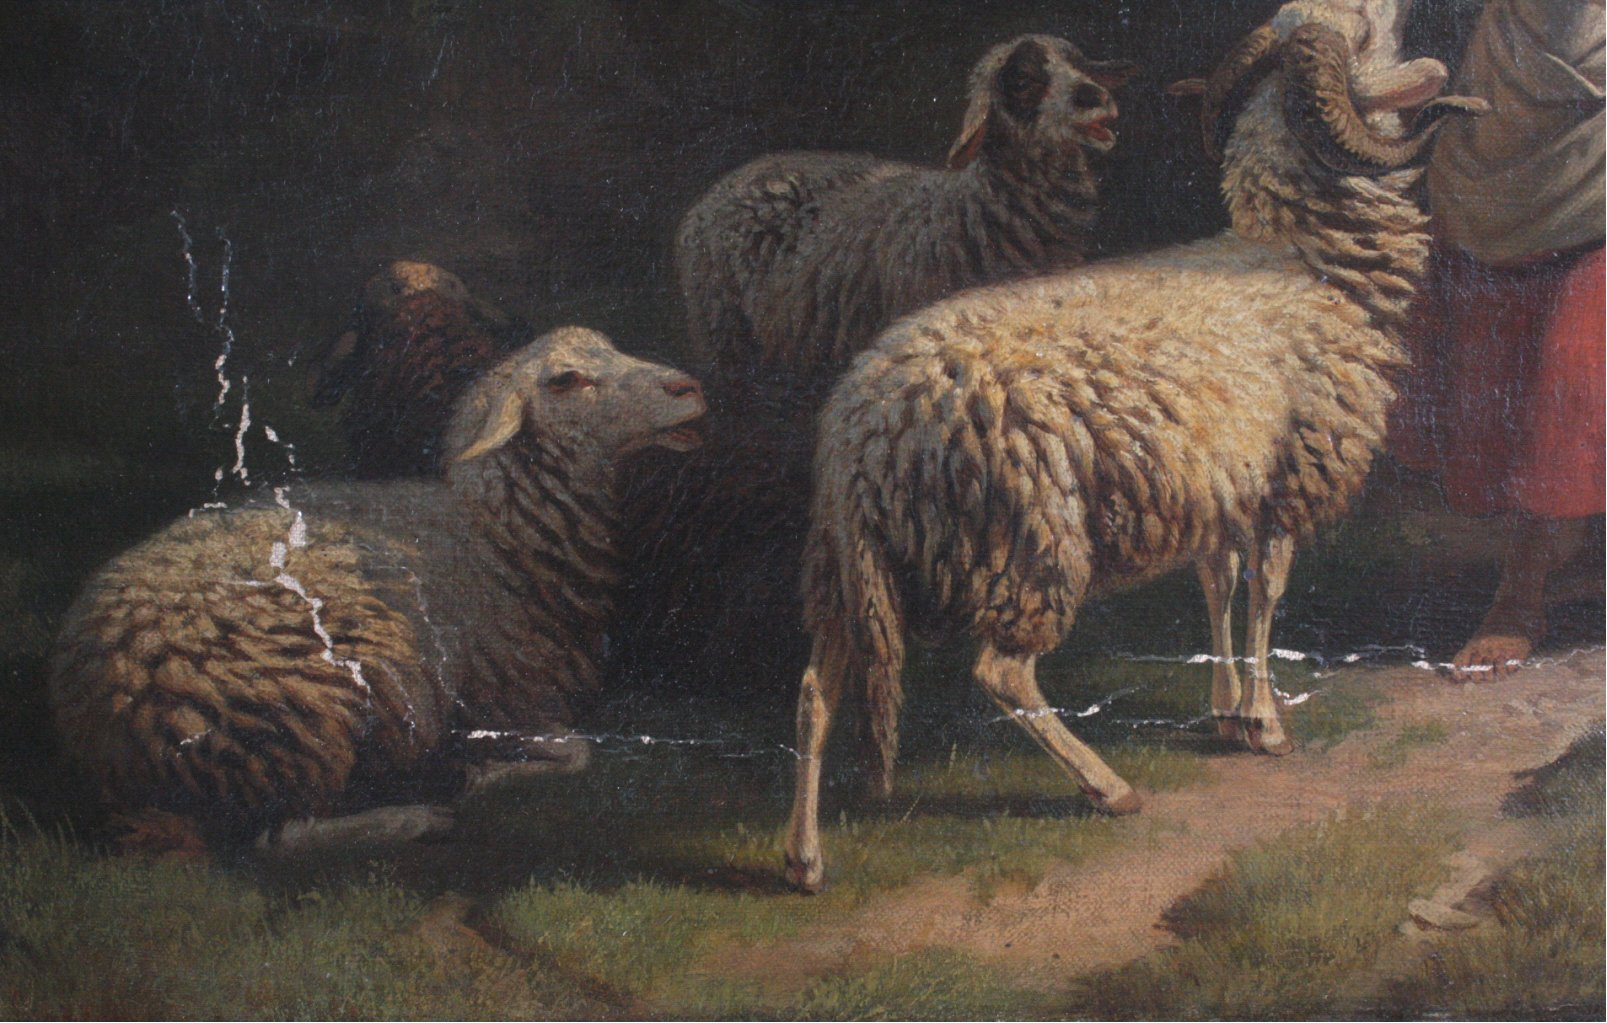 Robert Eberle, 1815-1860-2